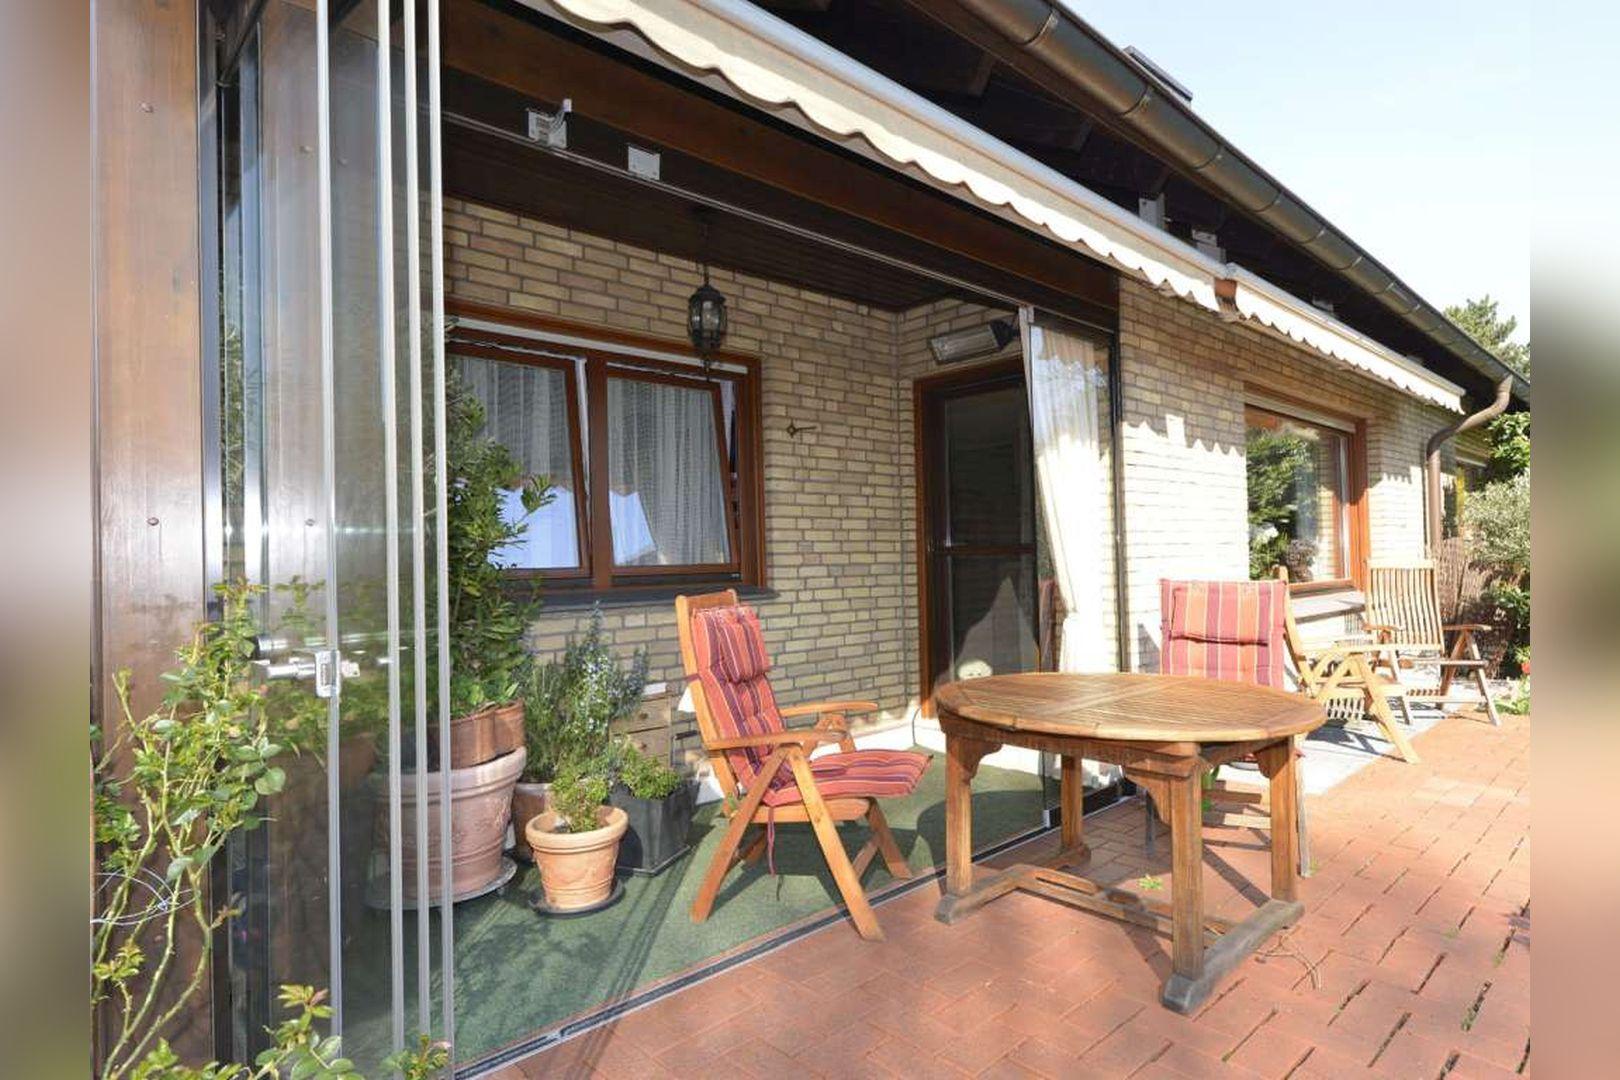 Immobilie Nr.0254 - Doppelhaushälfte rechtsbündig mit Garage & Carport  - Bild 5.jpg